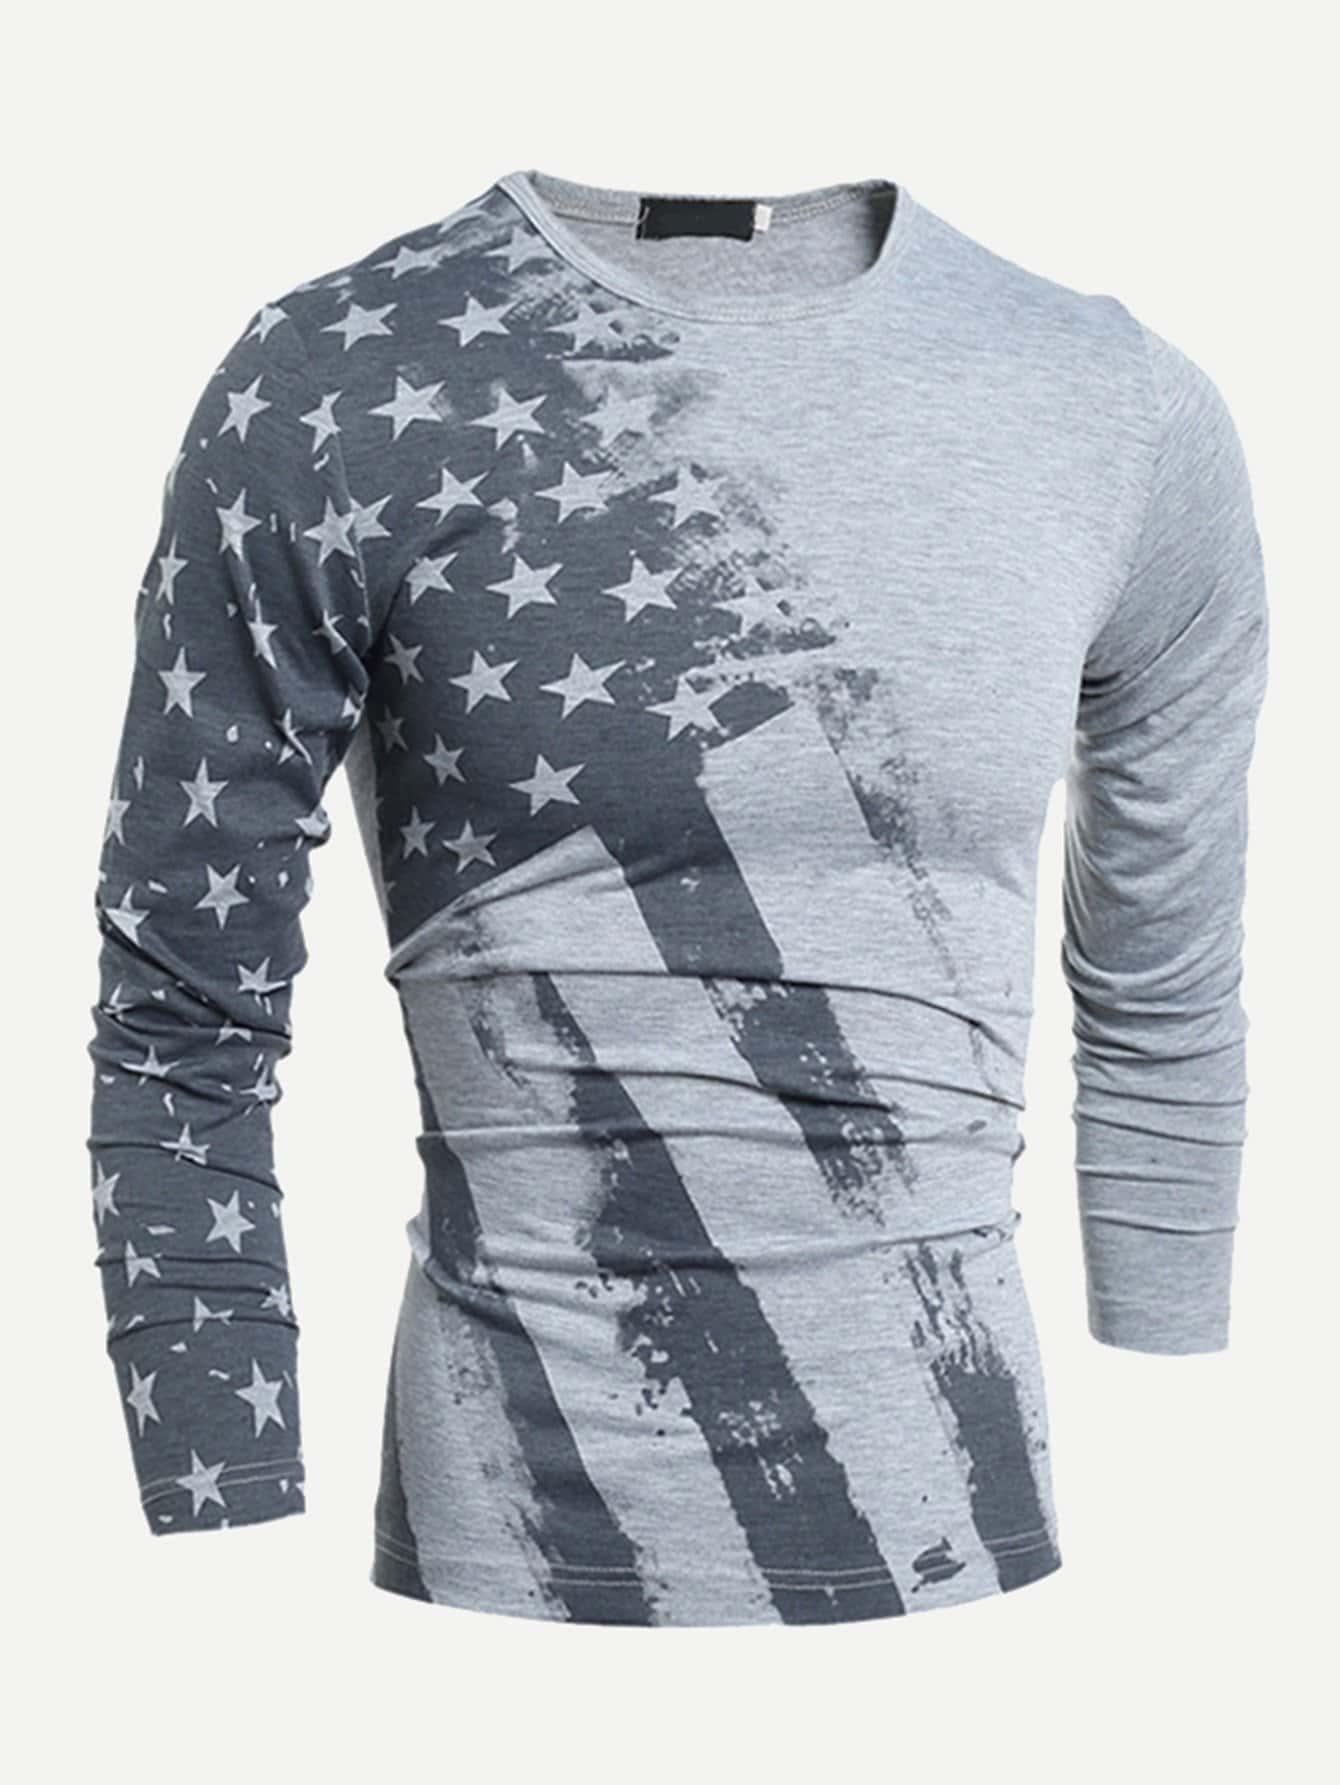 Männer T-Shirt mit Amerikanische Flagge Muster